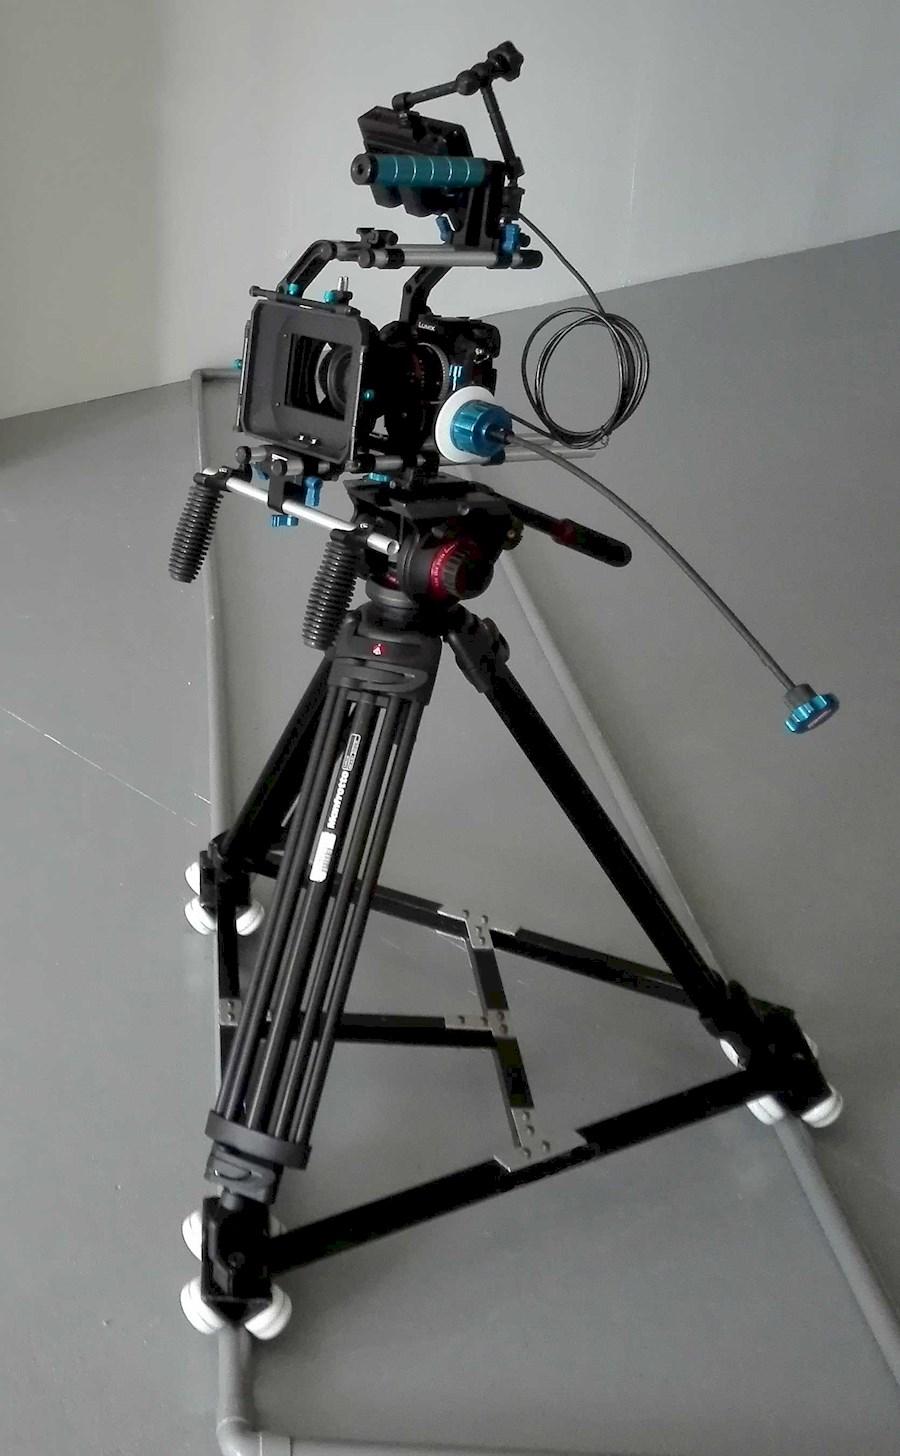 Rent a GH4 4k camera set. Inclusief lenzen, rig, afkijk scherm statief en dolly in Nieuwkuijk from BLICK FILM & LIVE V.O.F.